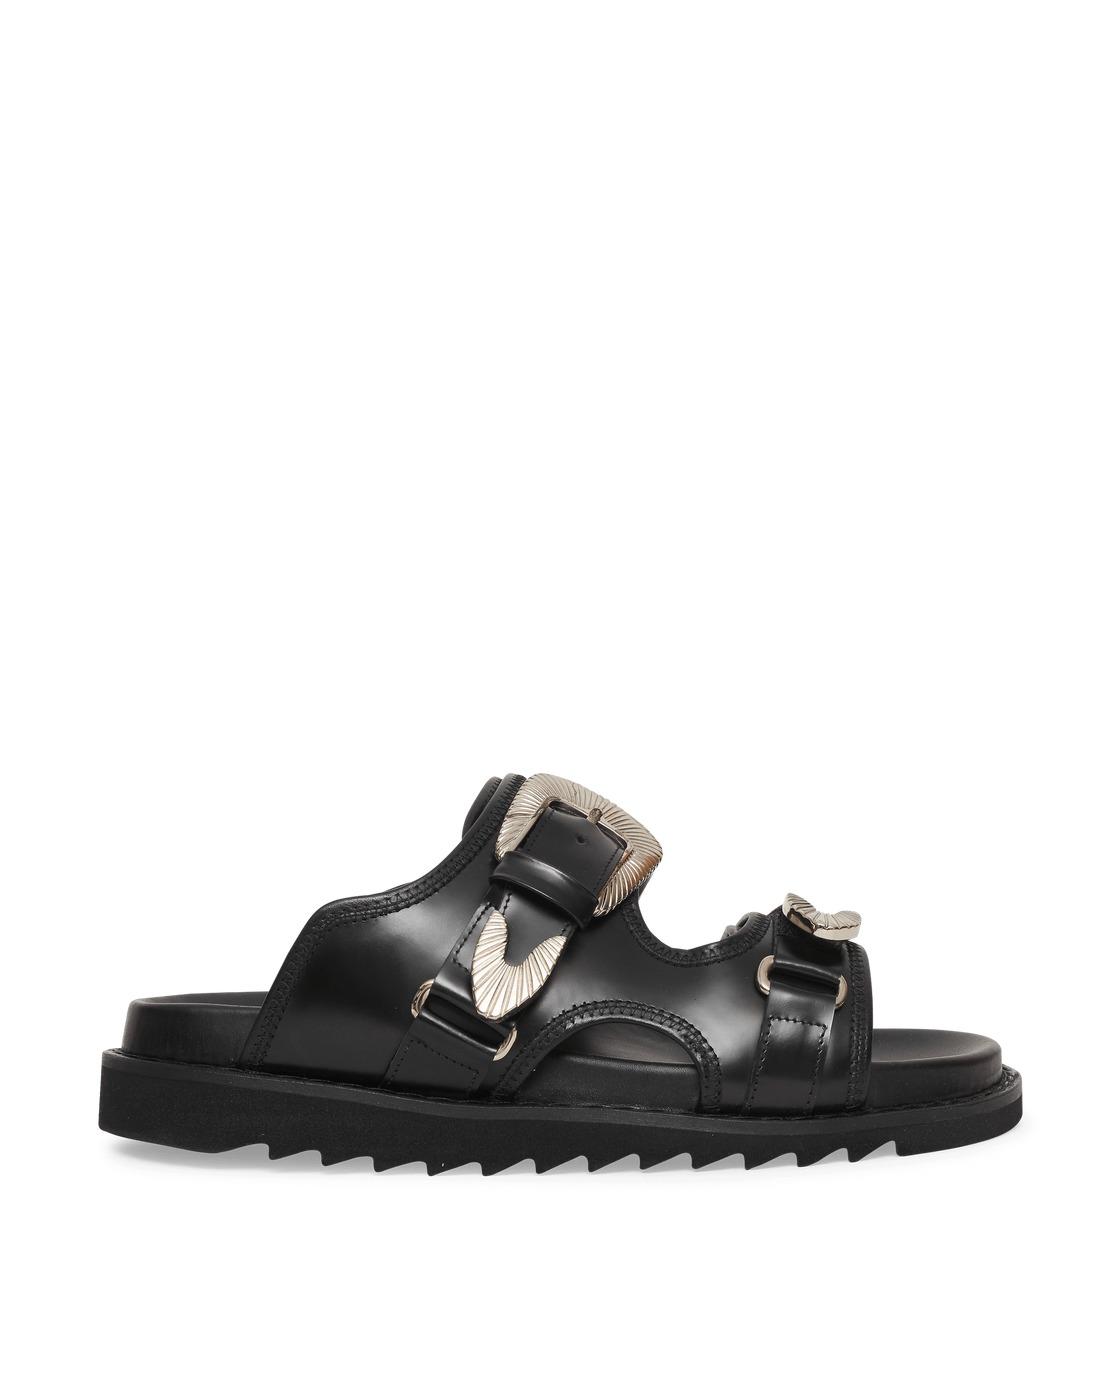 Toga Virilis Polido Sandals Black